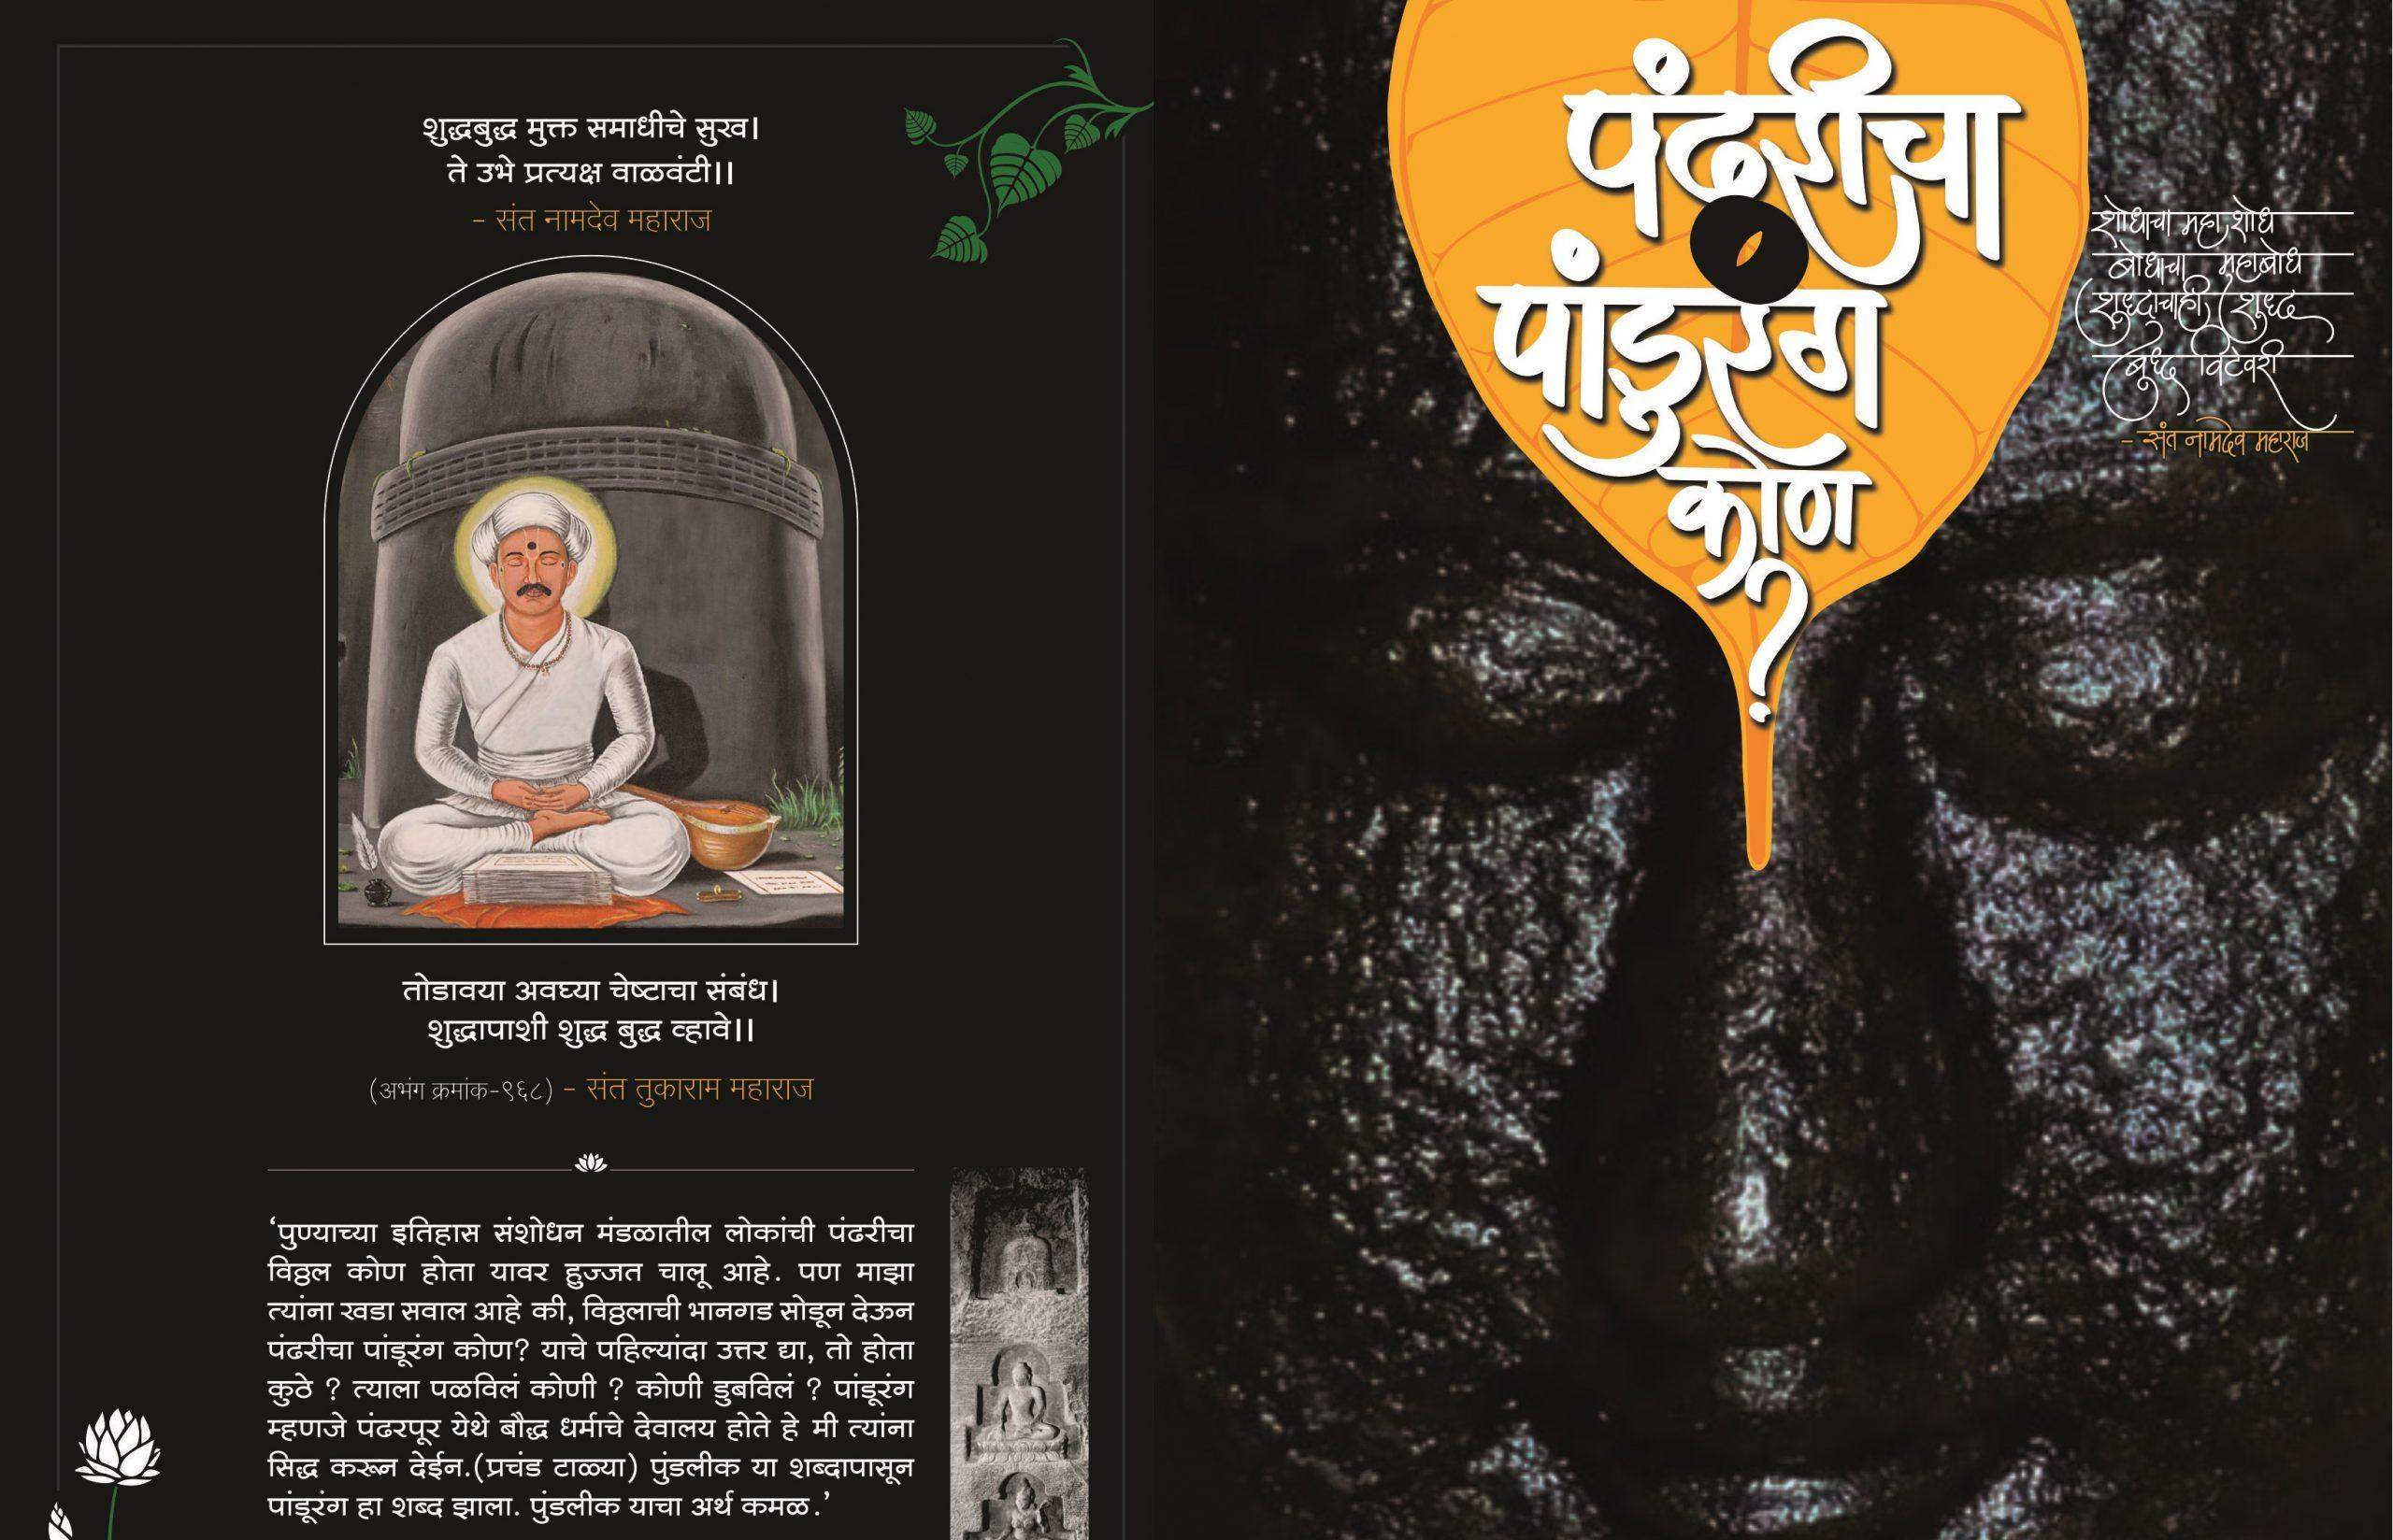 Book Release Virtual Program – Organized by Buddhist International Network.